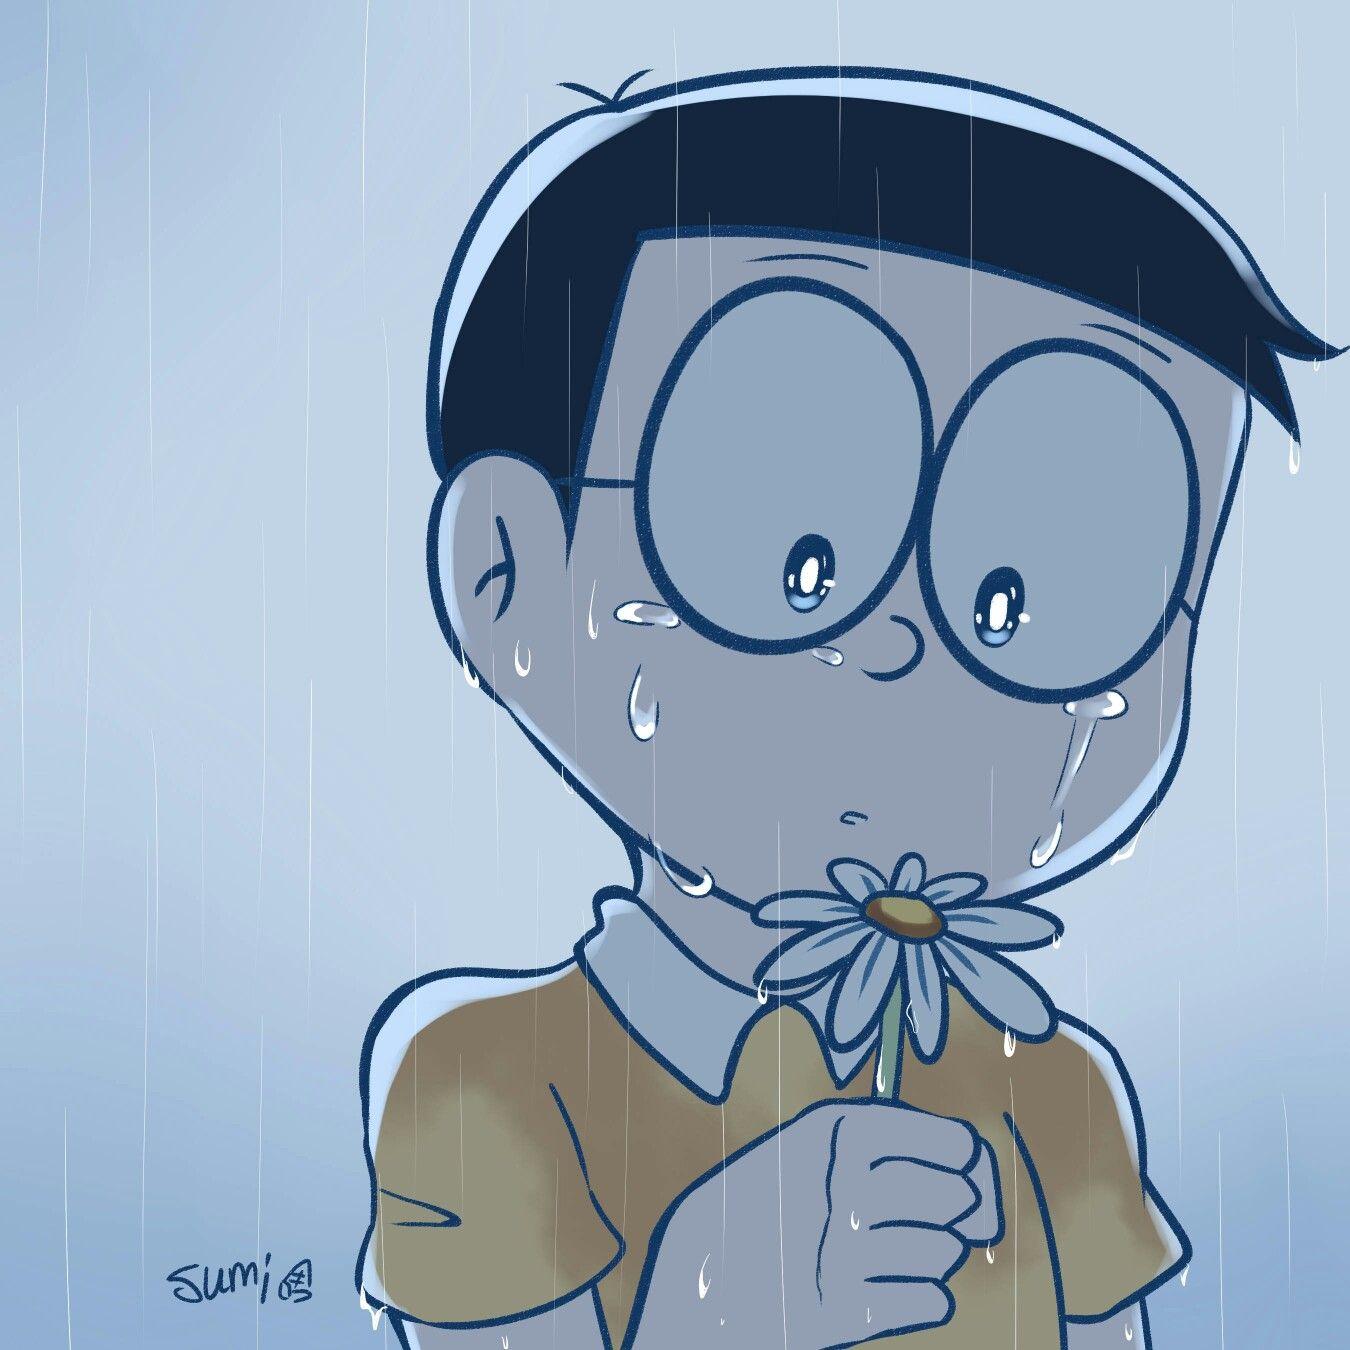 Pin oleh Doraemon HD ficial 1 di Đoraemon